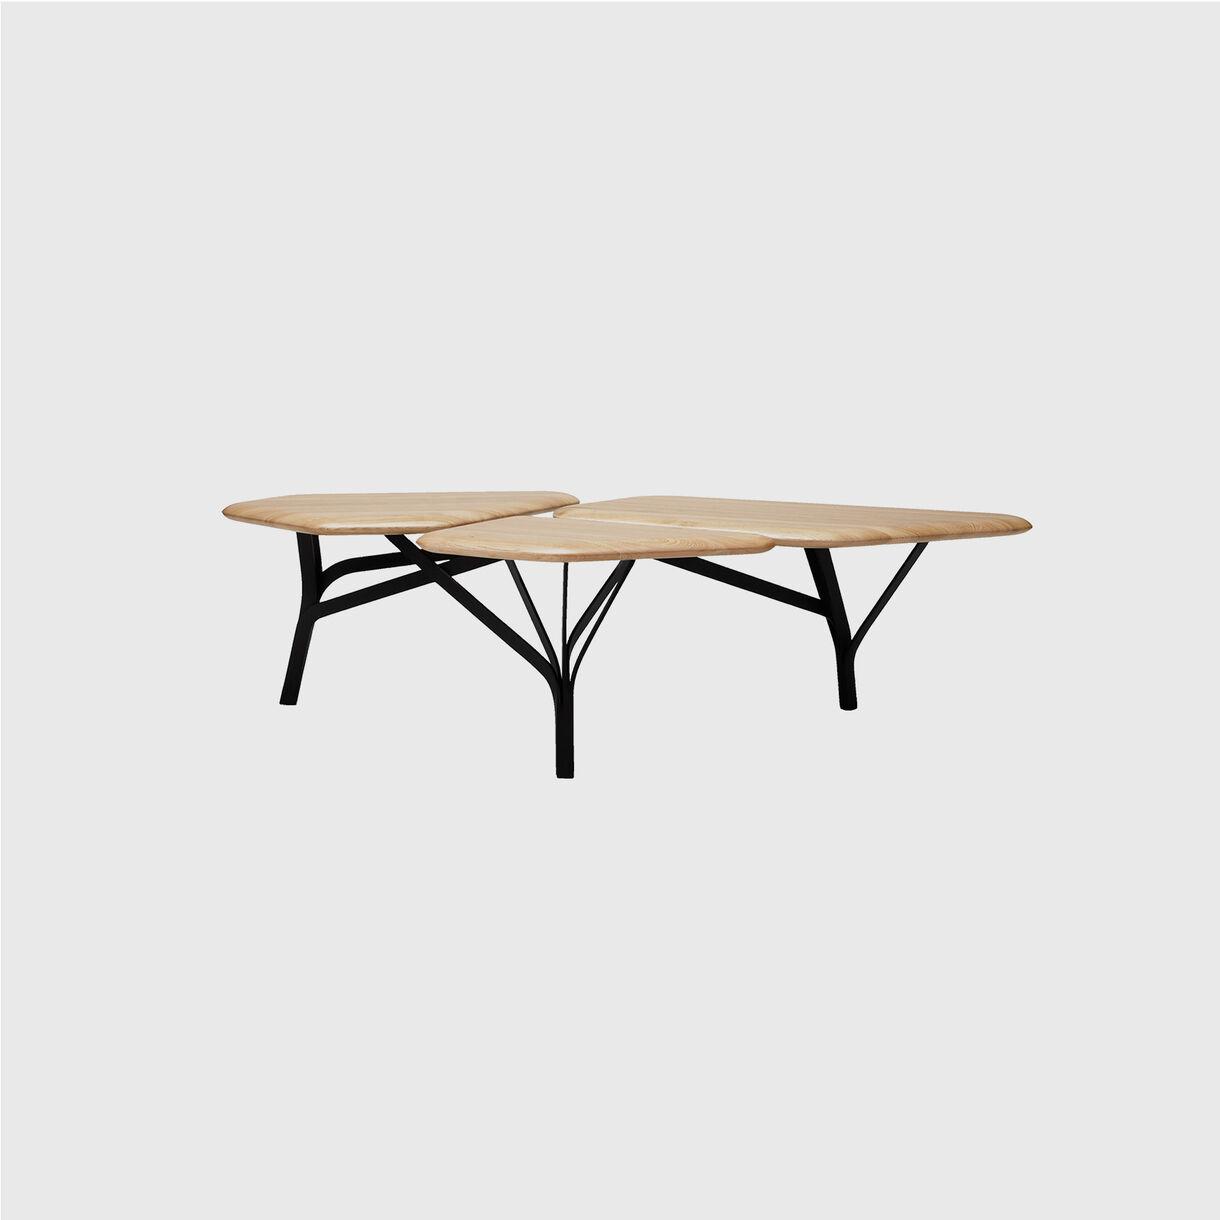 Borghese Coffee Table, Natural Oak